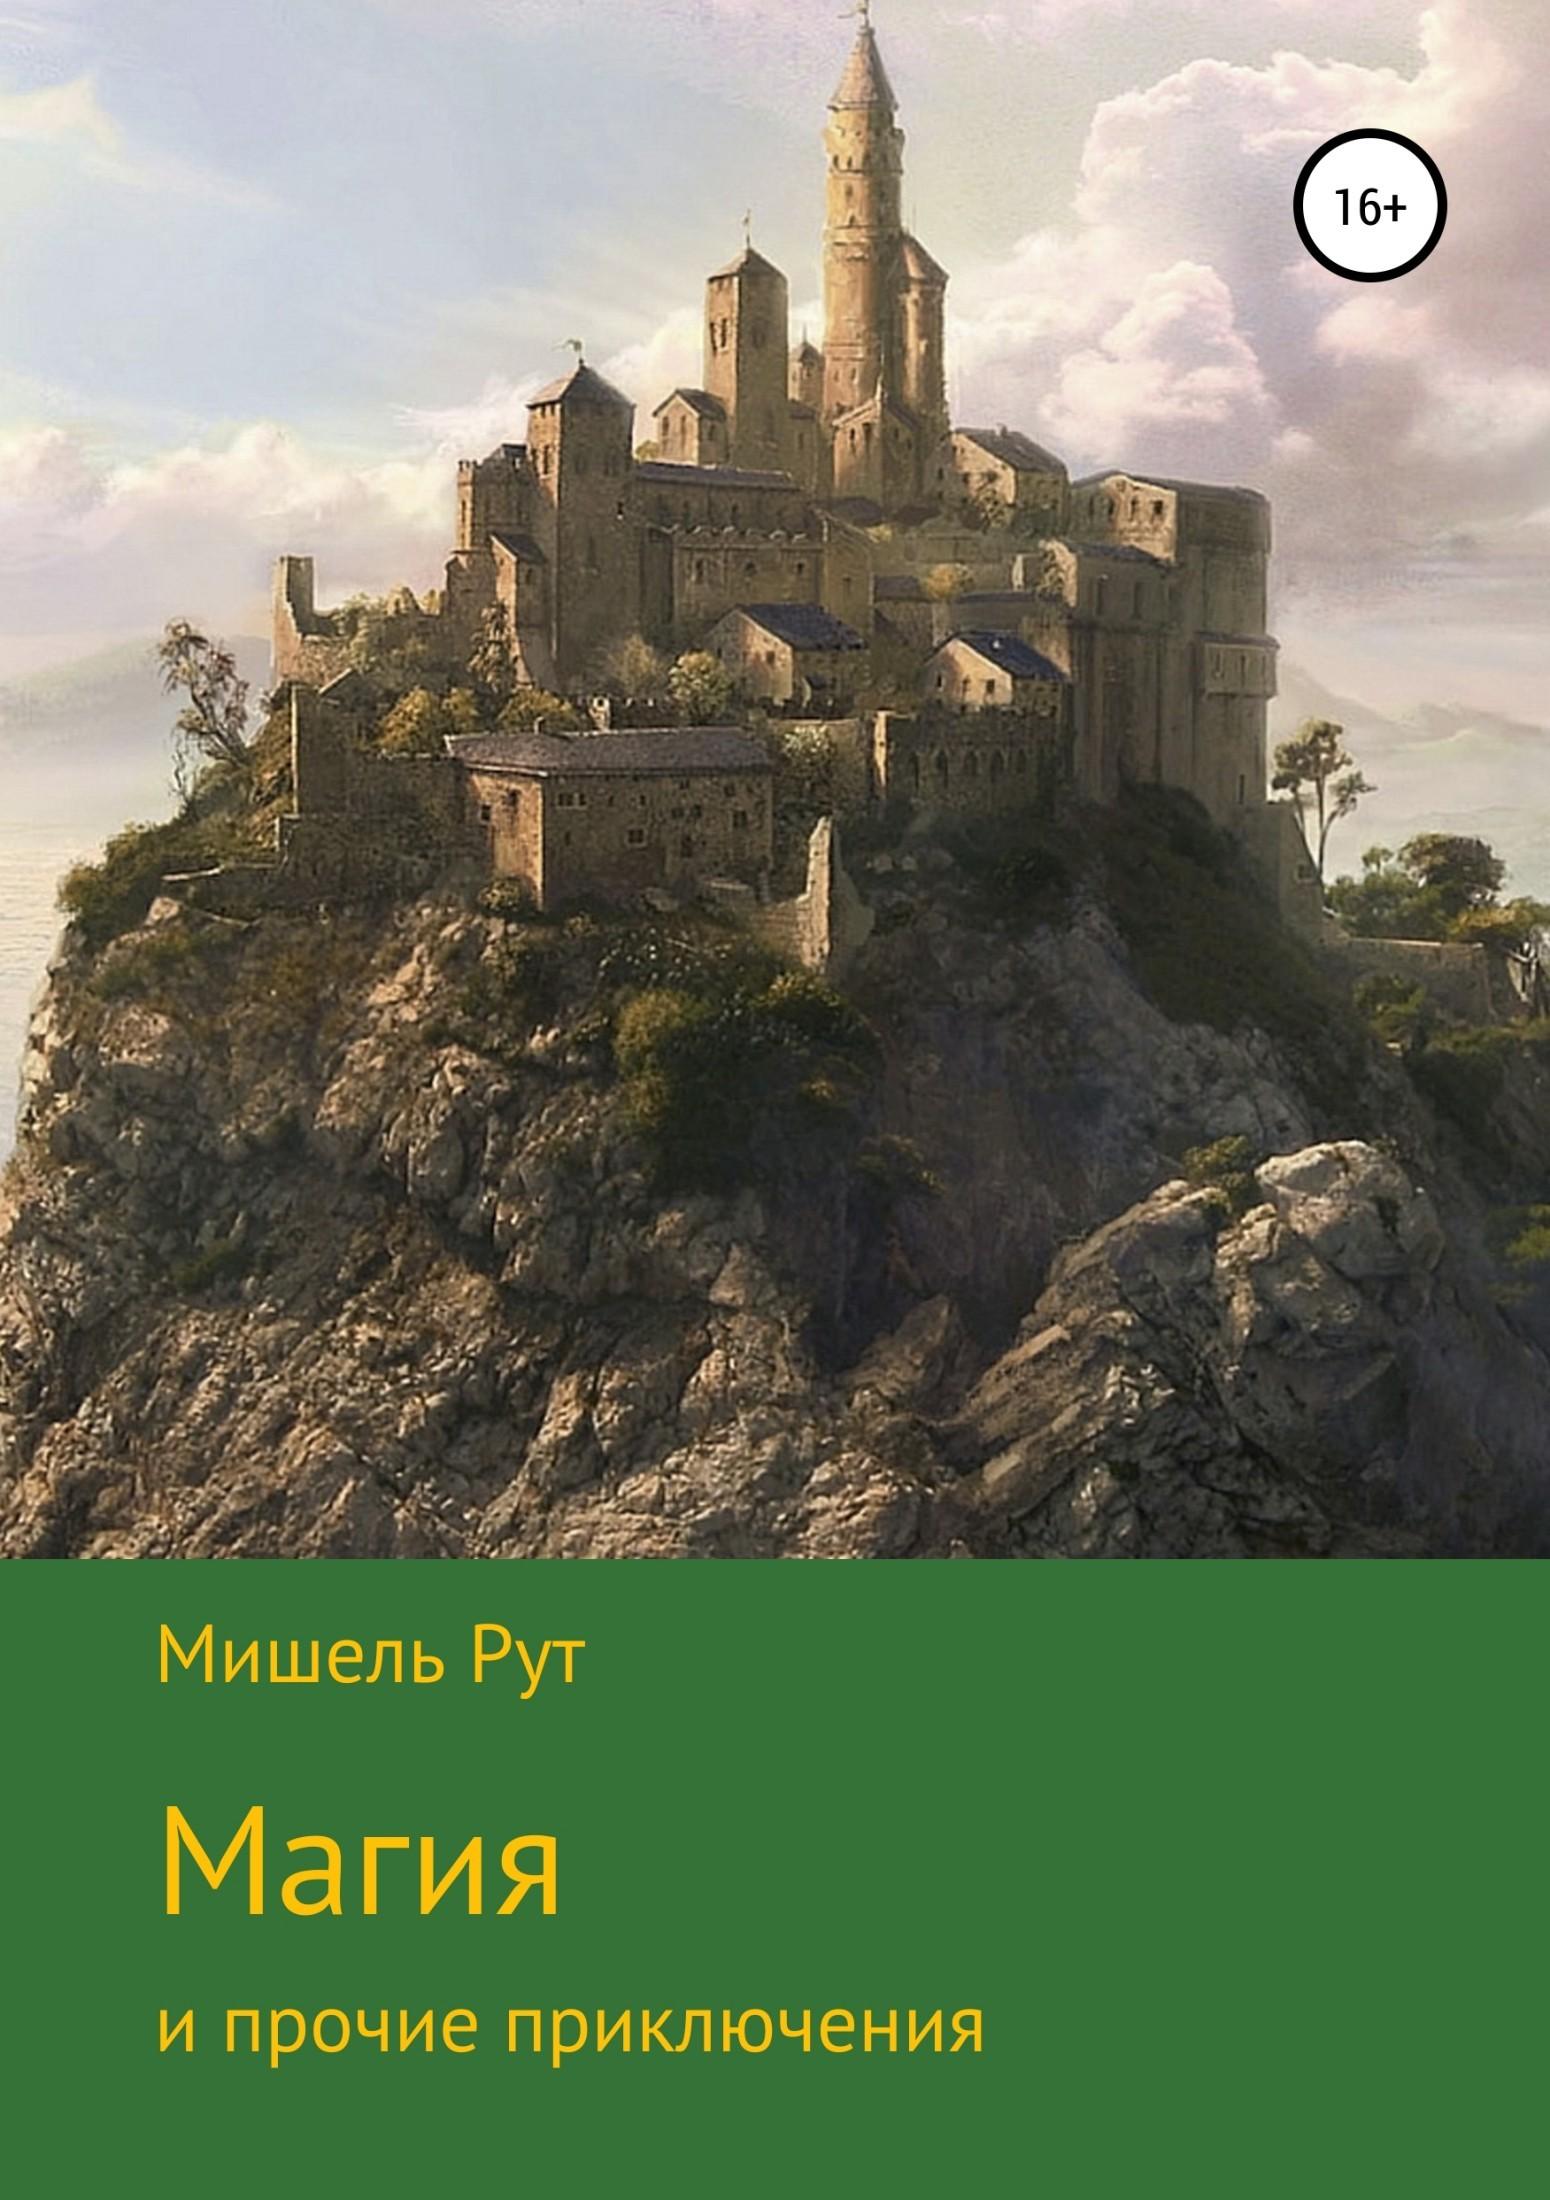 Магия и прочие приключения